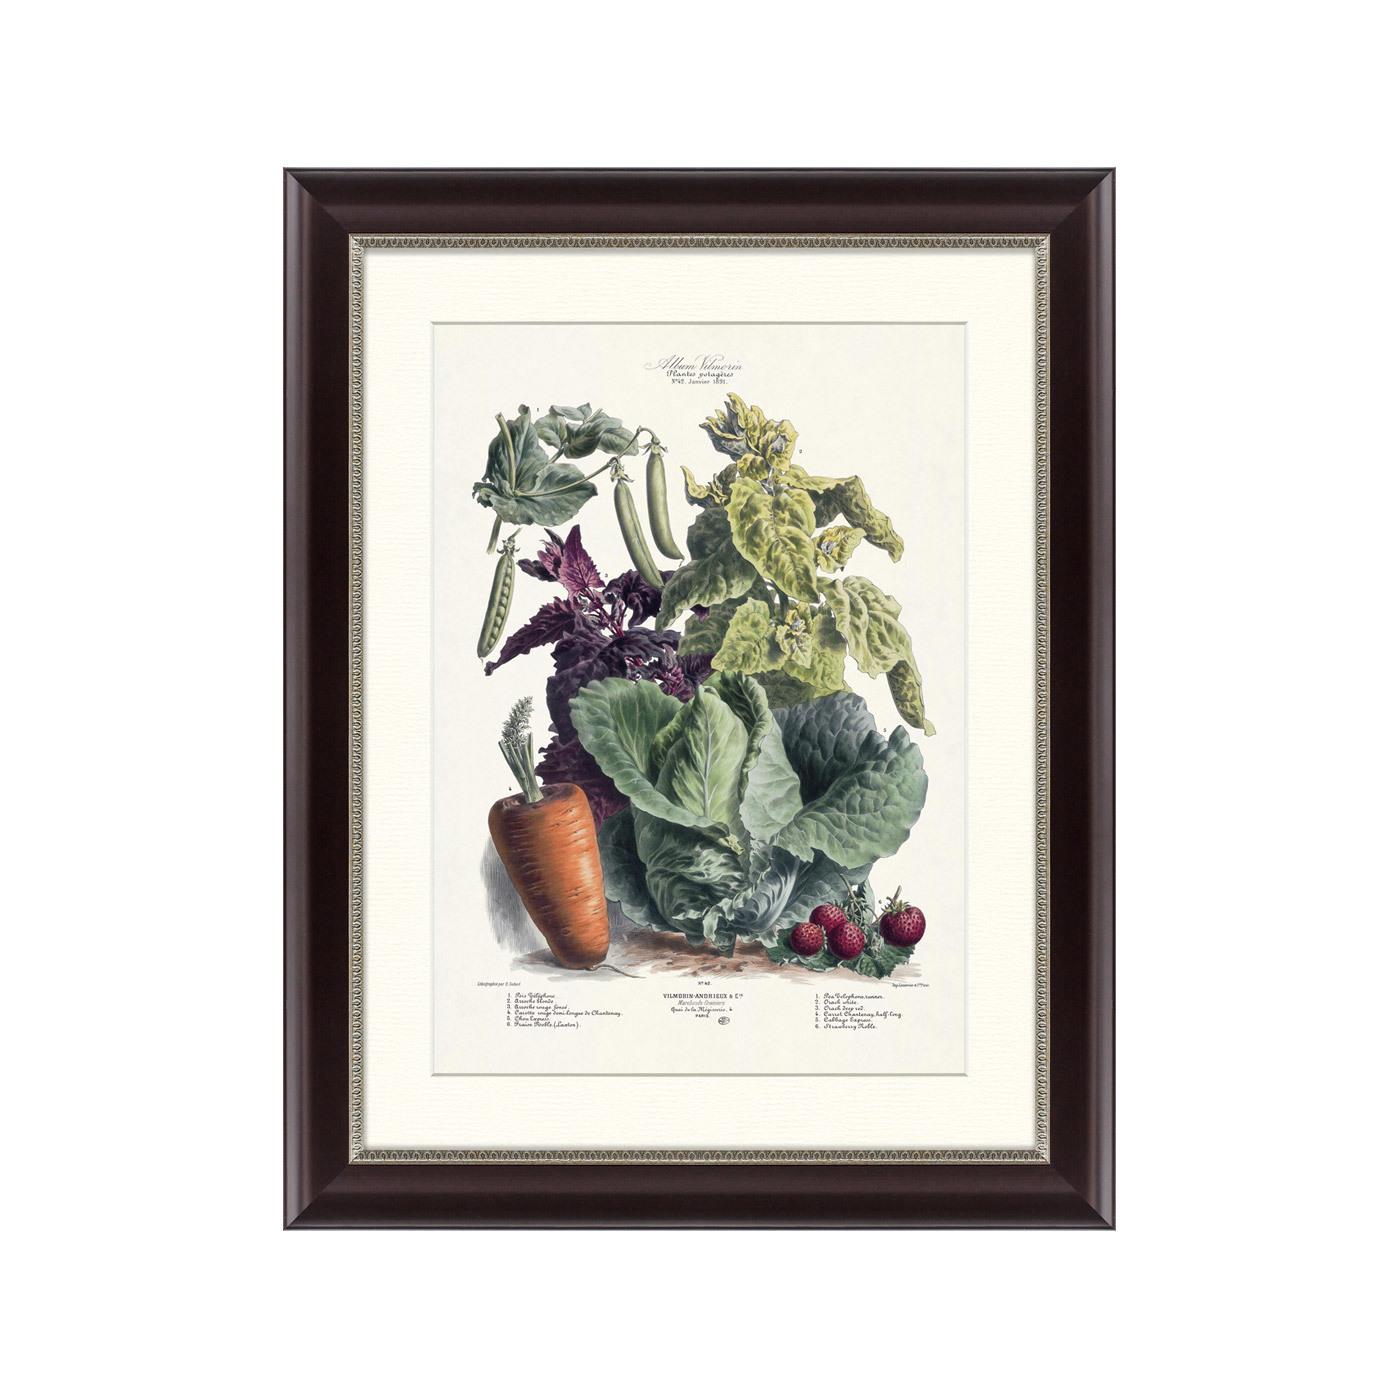 {} Картины в Квартиру Картина Vilmorin Andrieux & Cie, Альбом №42 (47х60 см) картины в квартиру картина пилигрим из мешхеда 47х60 см